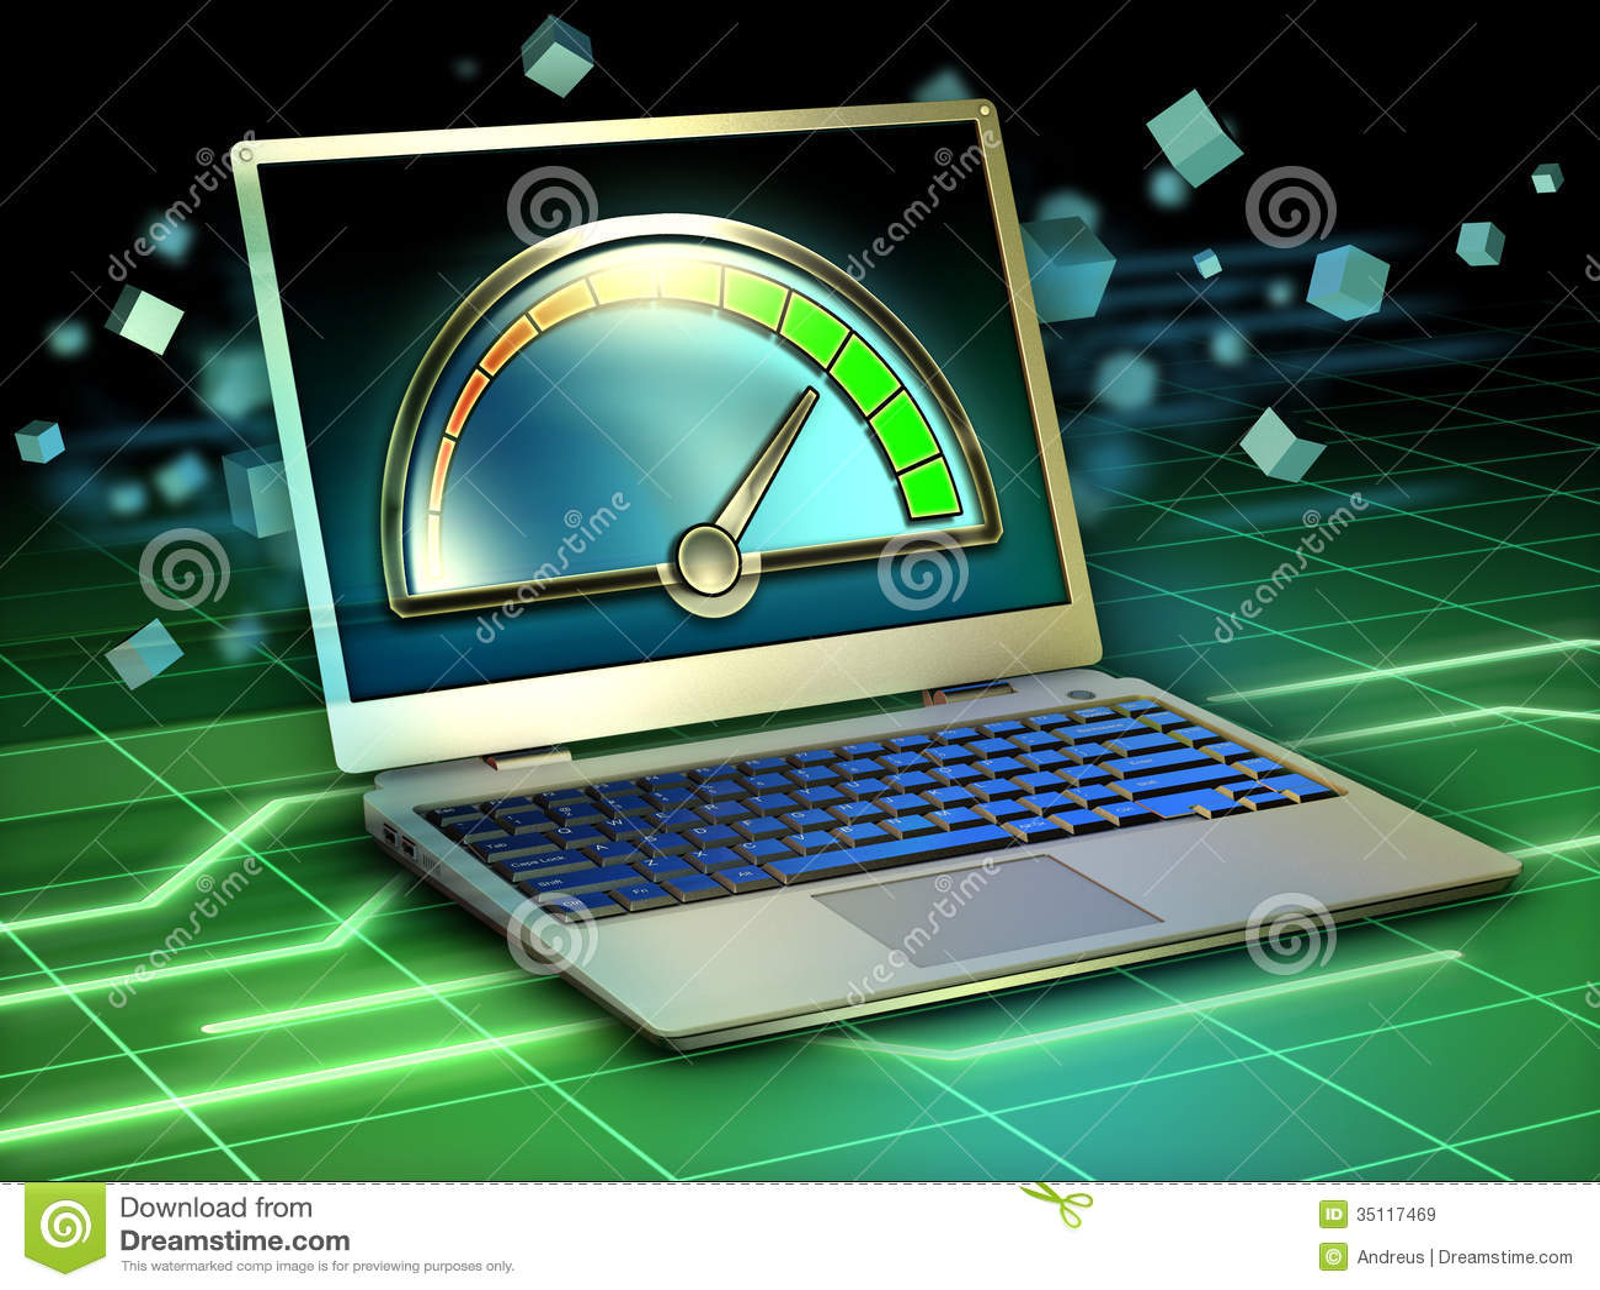 Optimize your RAID configurations for maximum performance